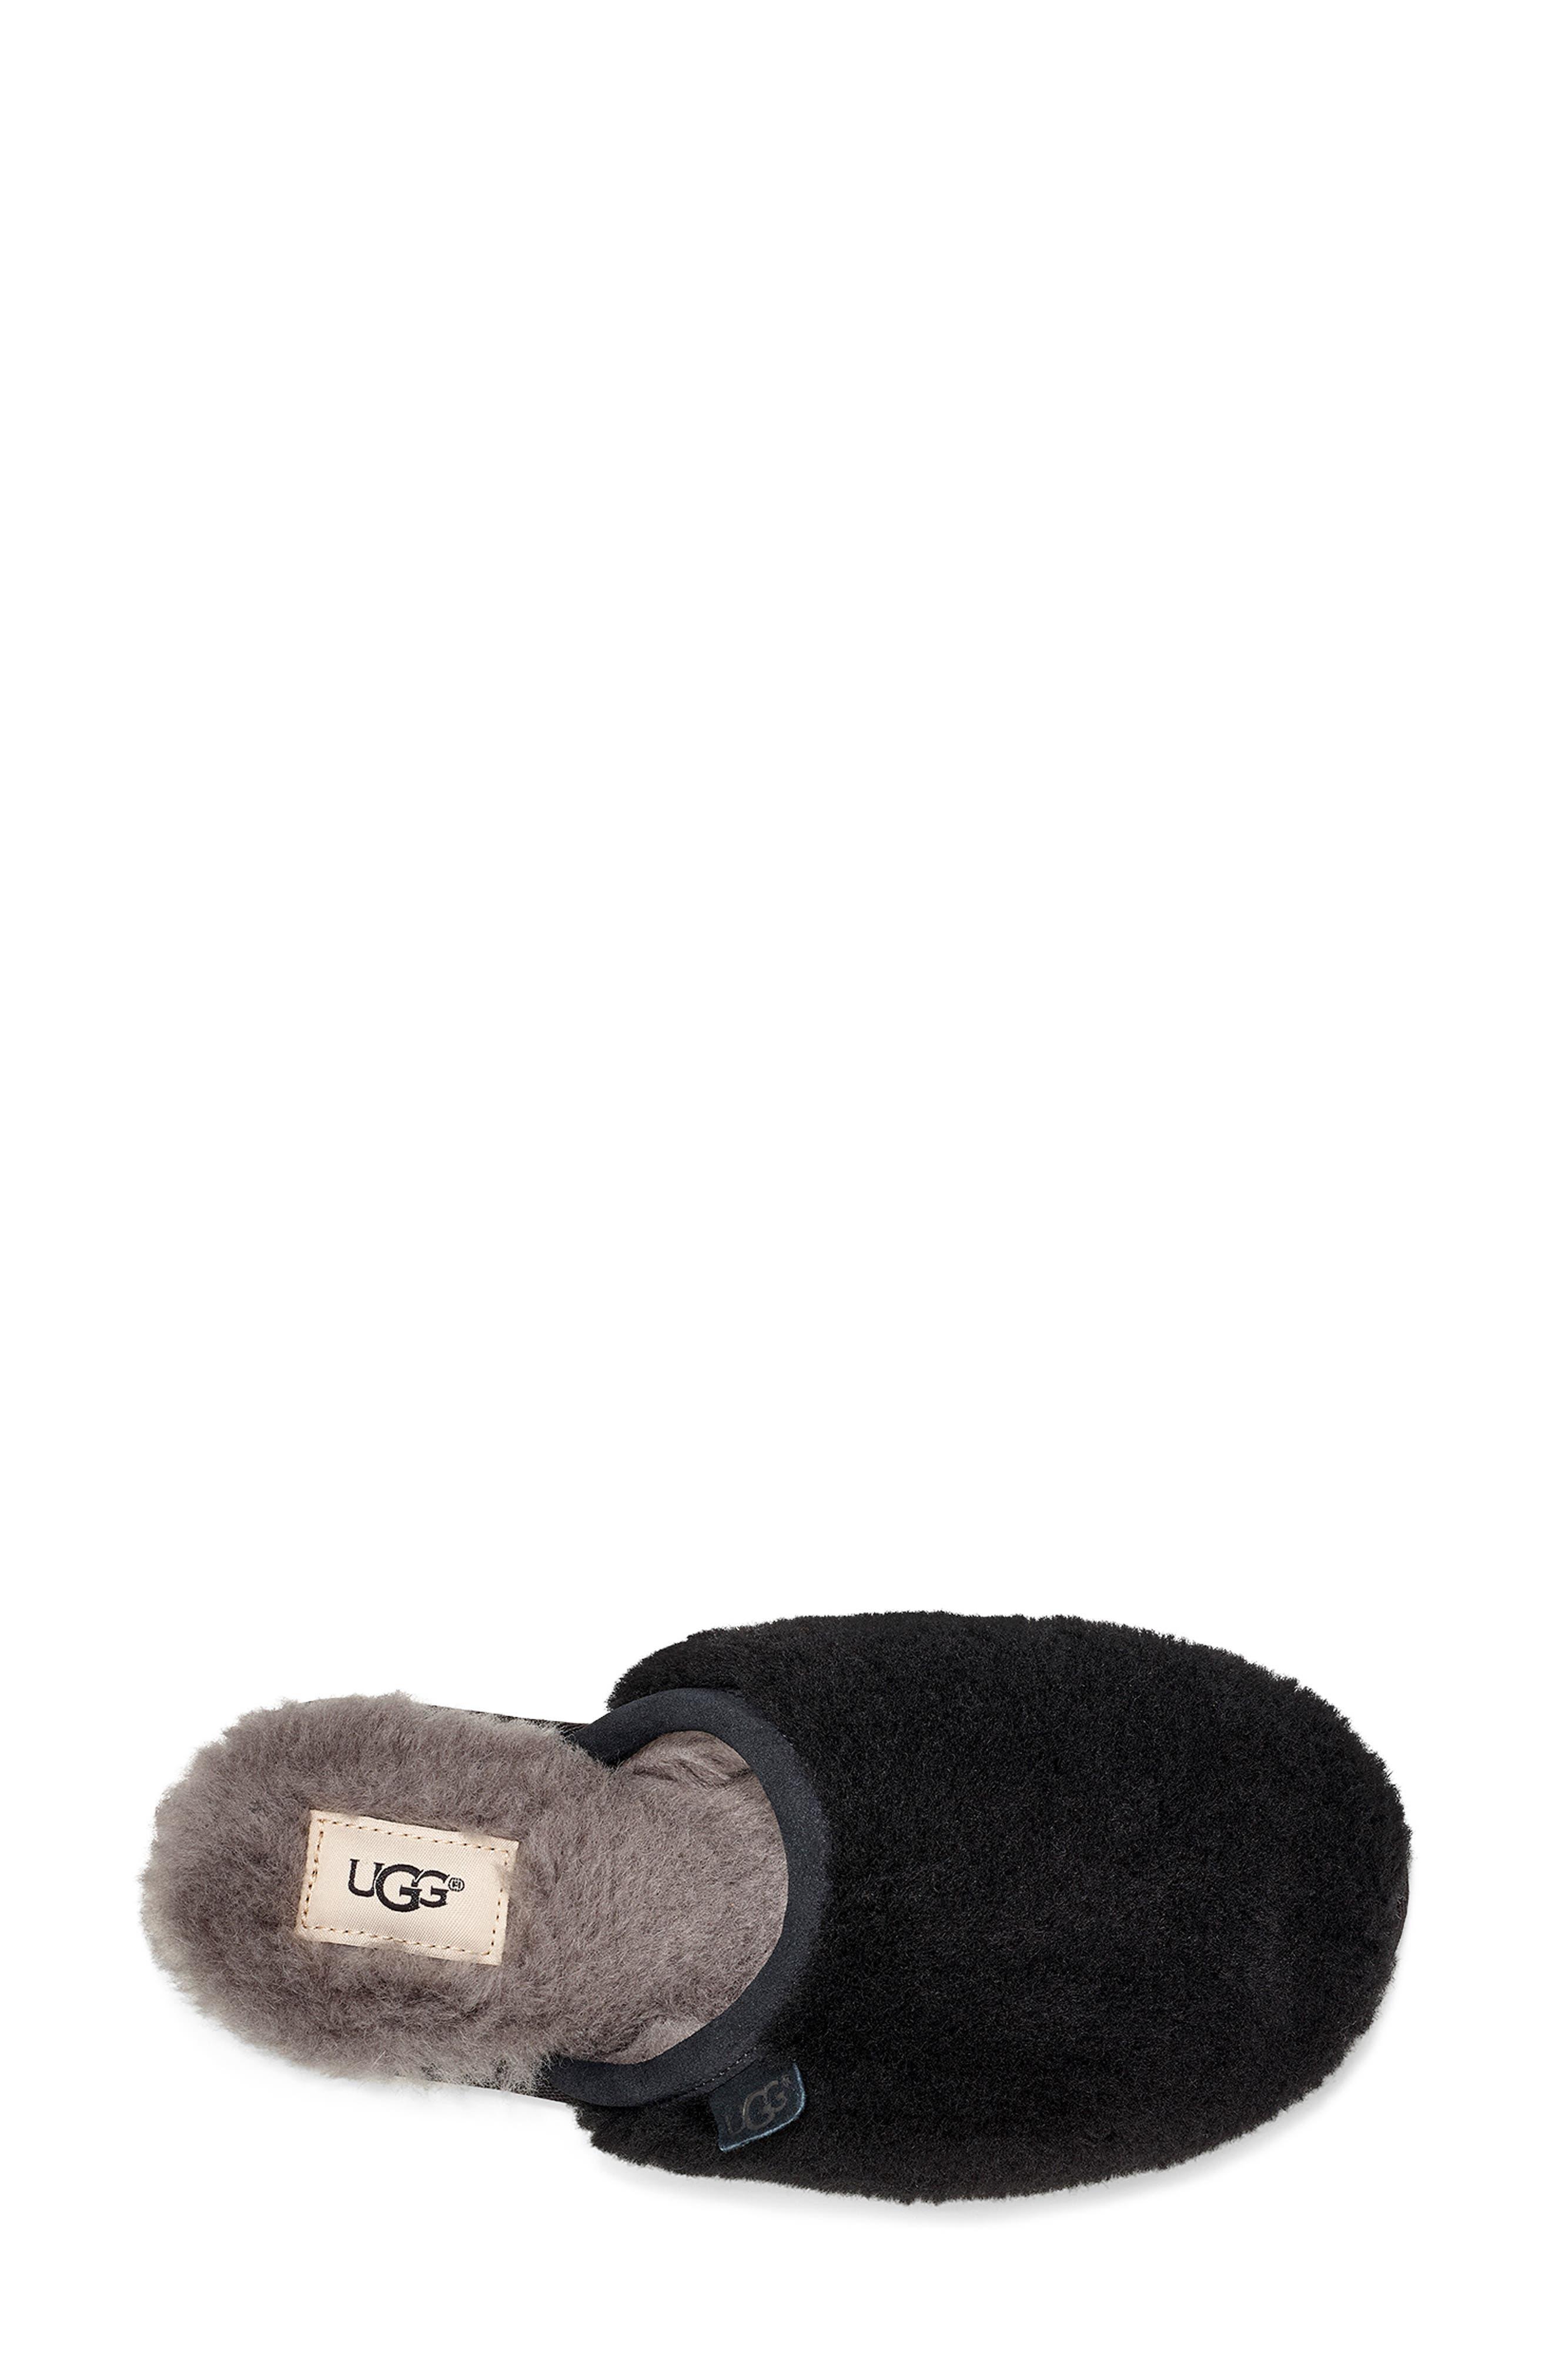 UGG<SUP>®</SUP>, Fluffette Slipper, Alternate thumbnail 4, color, BLACK WOOL